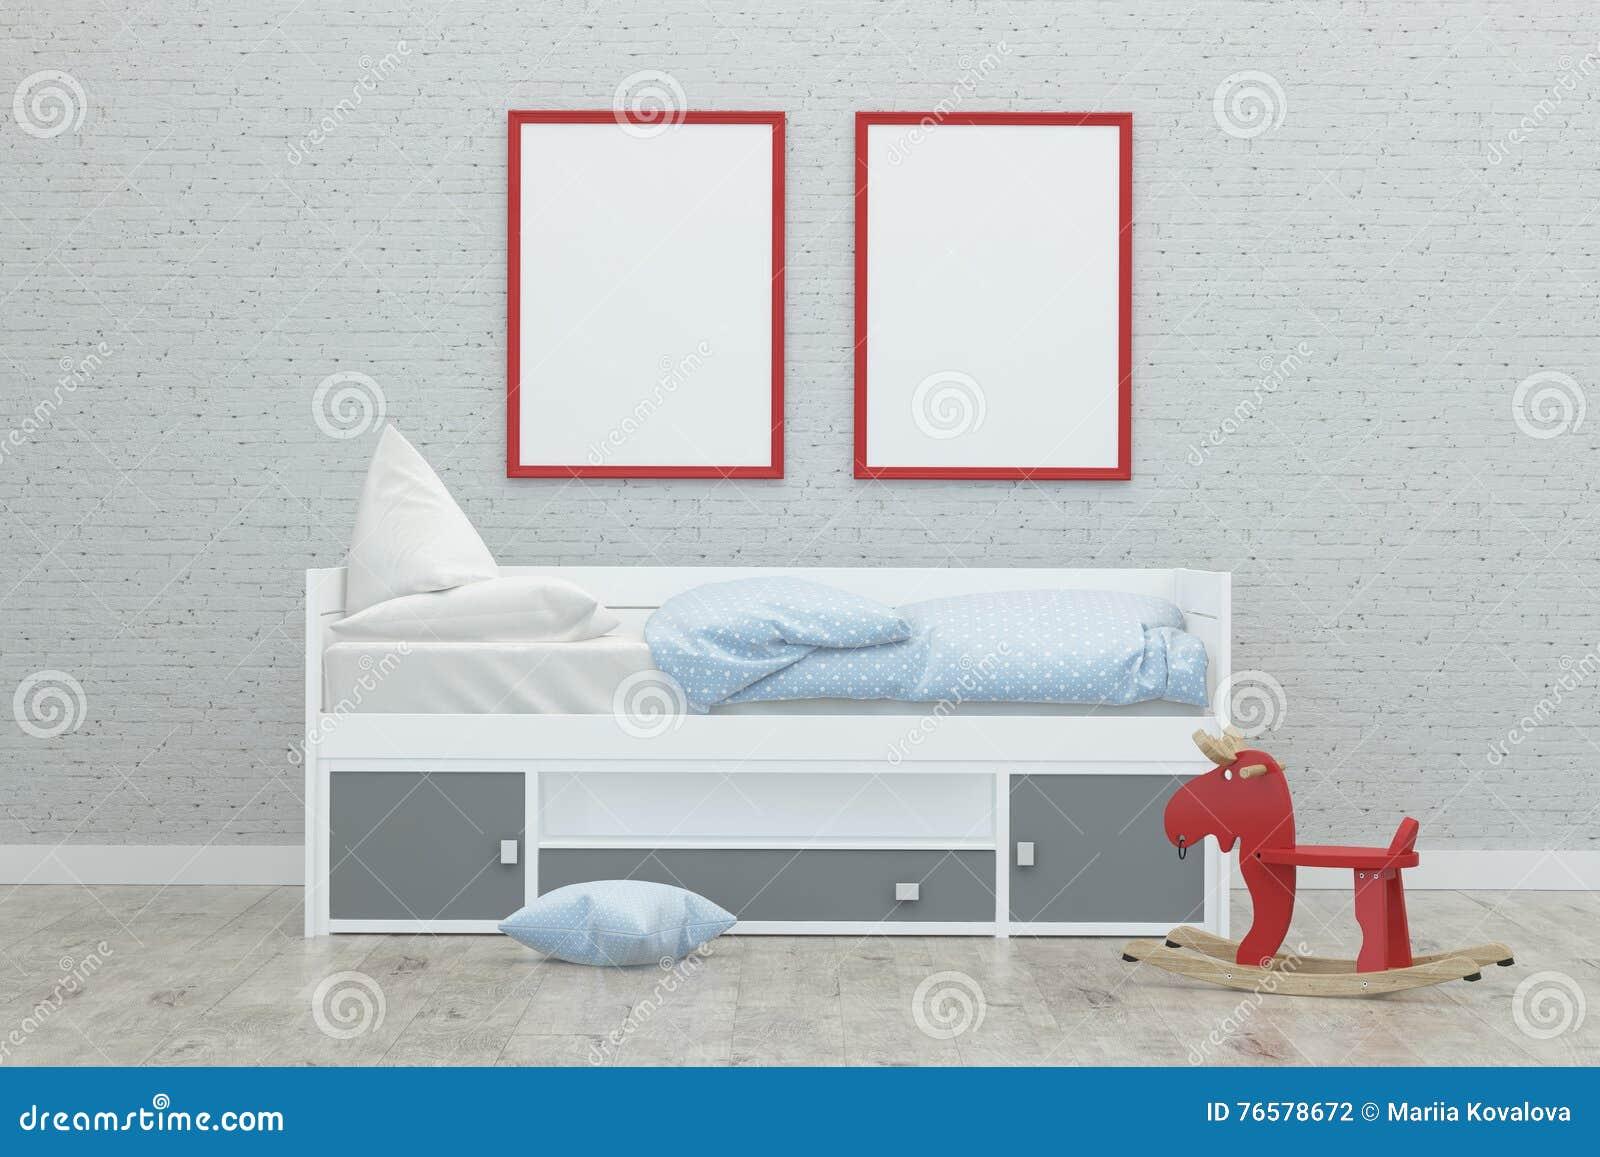 Exterior: Kids Game Room Interior 3d Rendering Image Stock